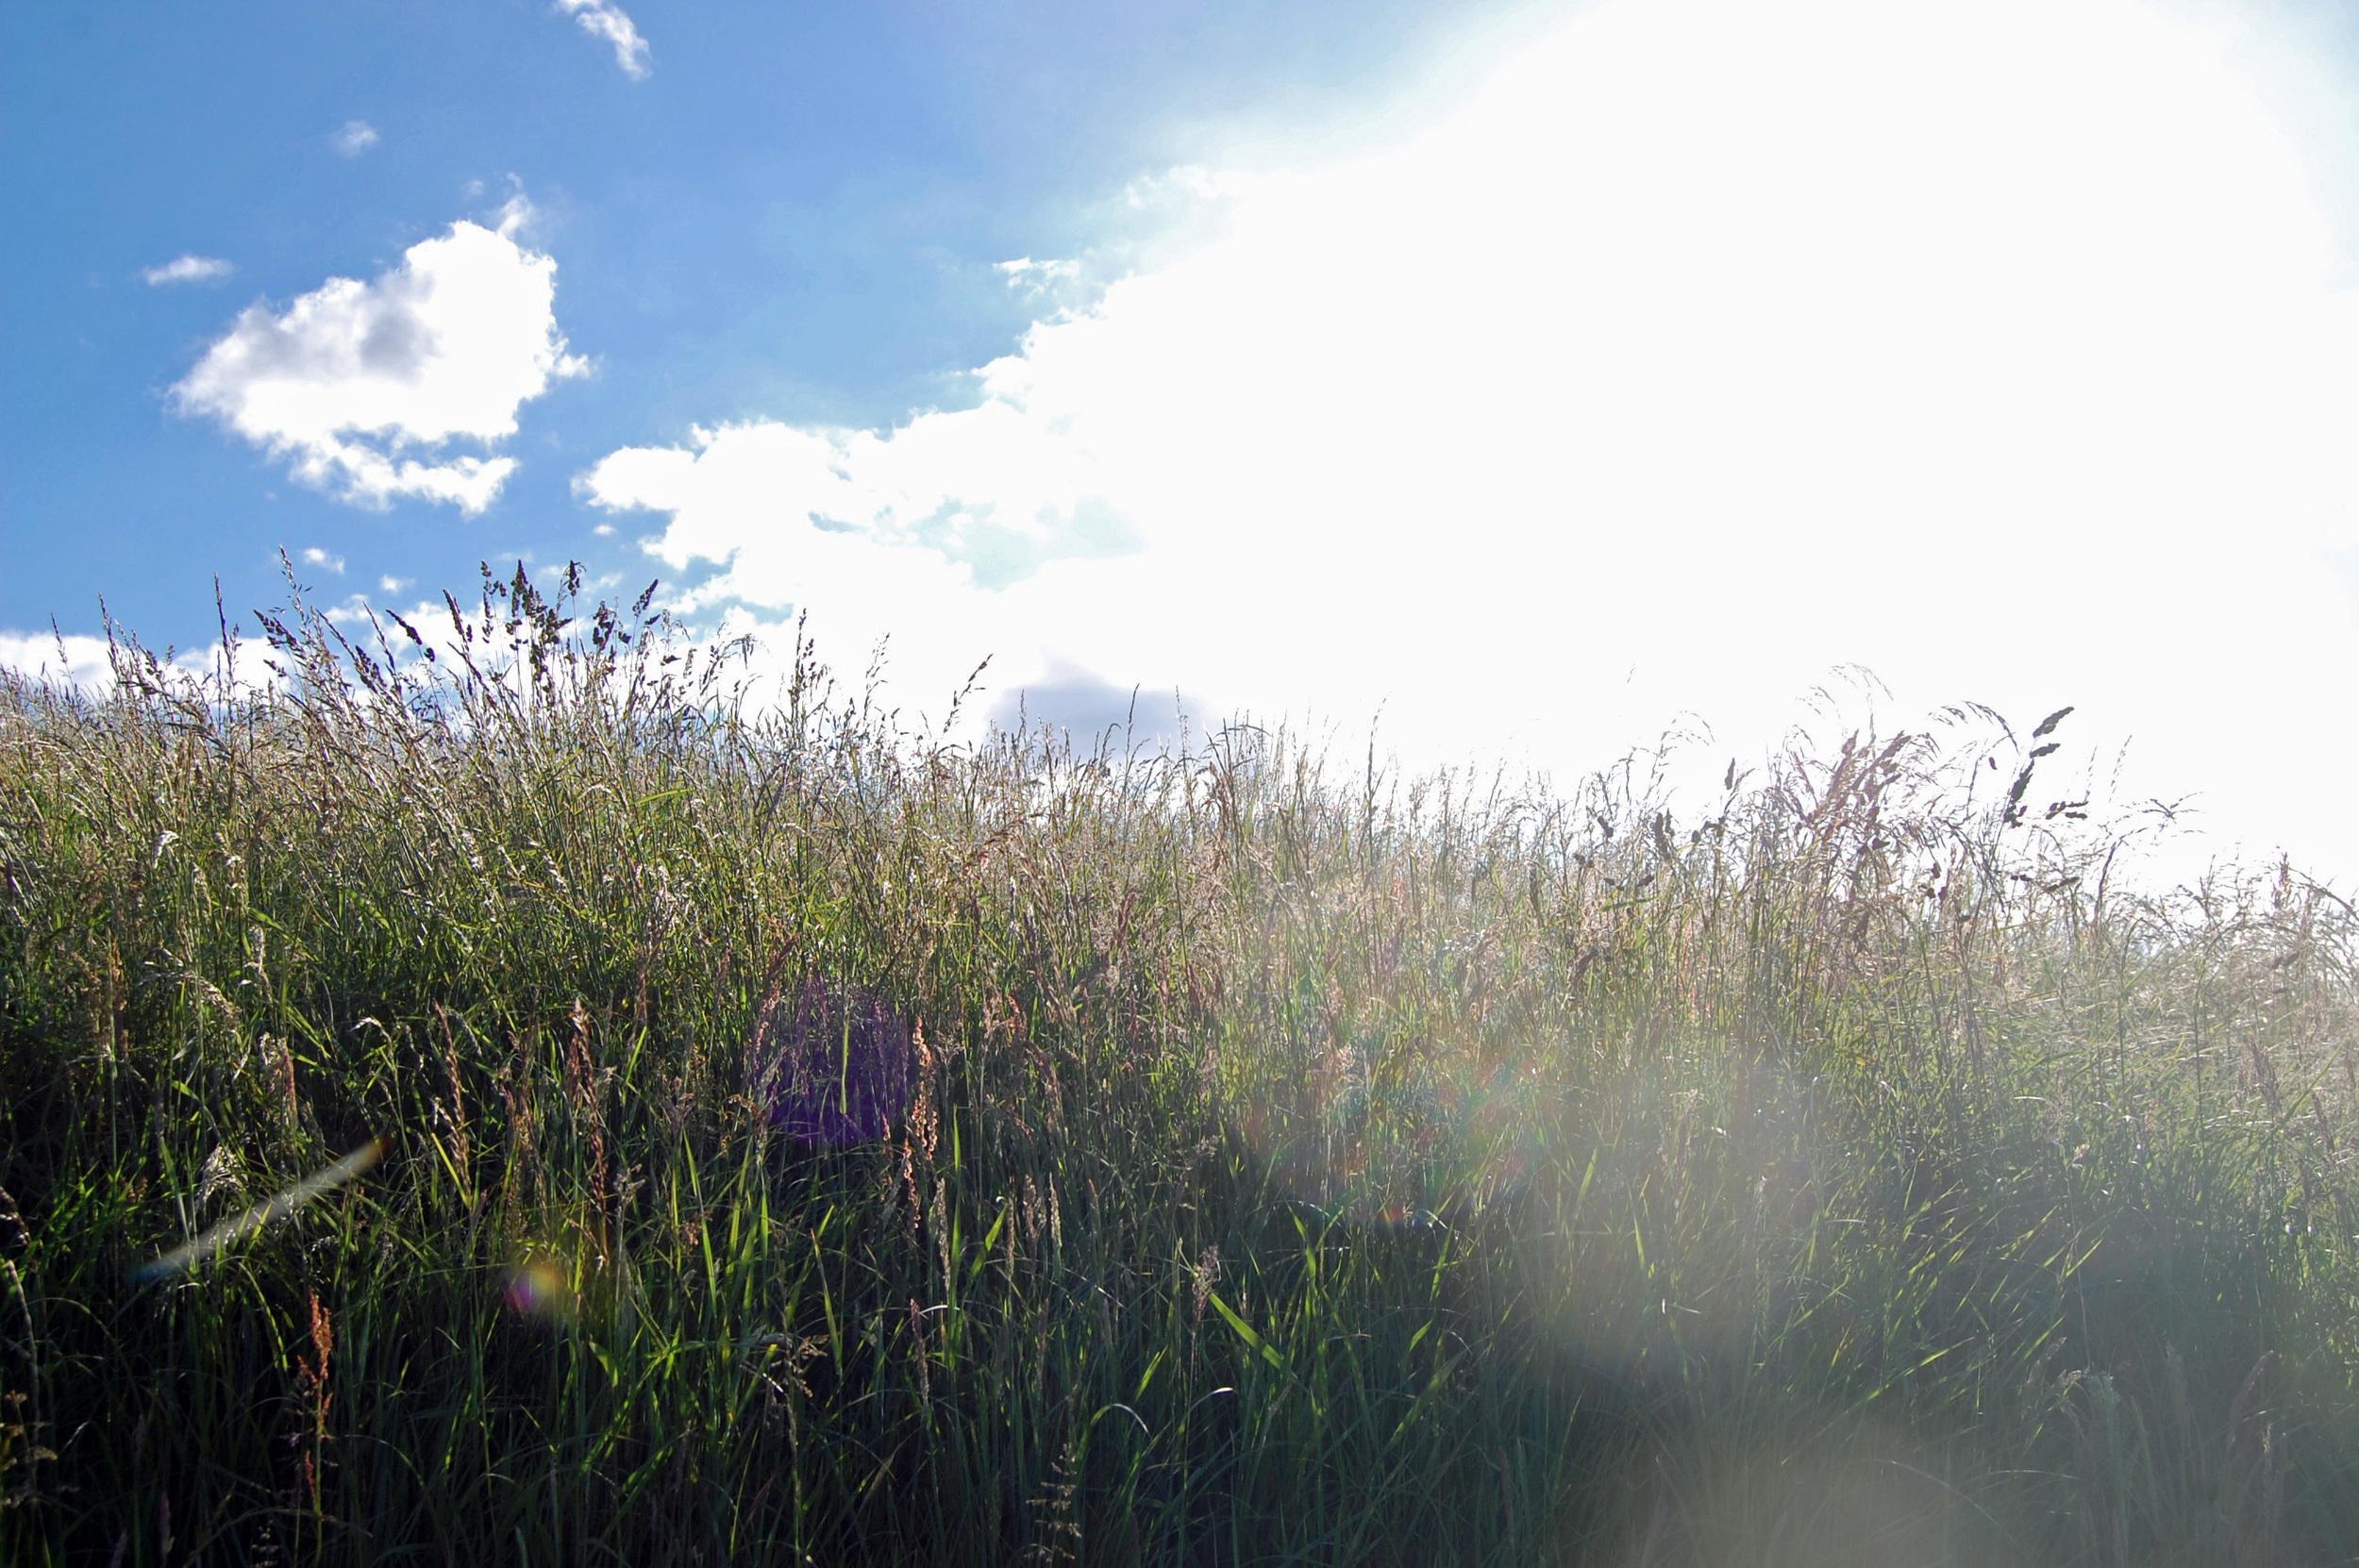 scottish field1.jpg